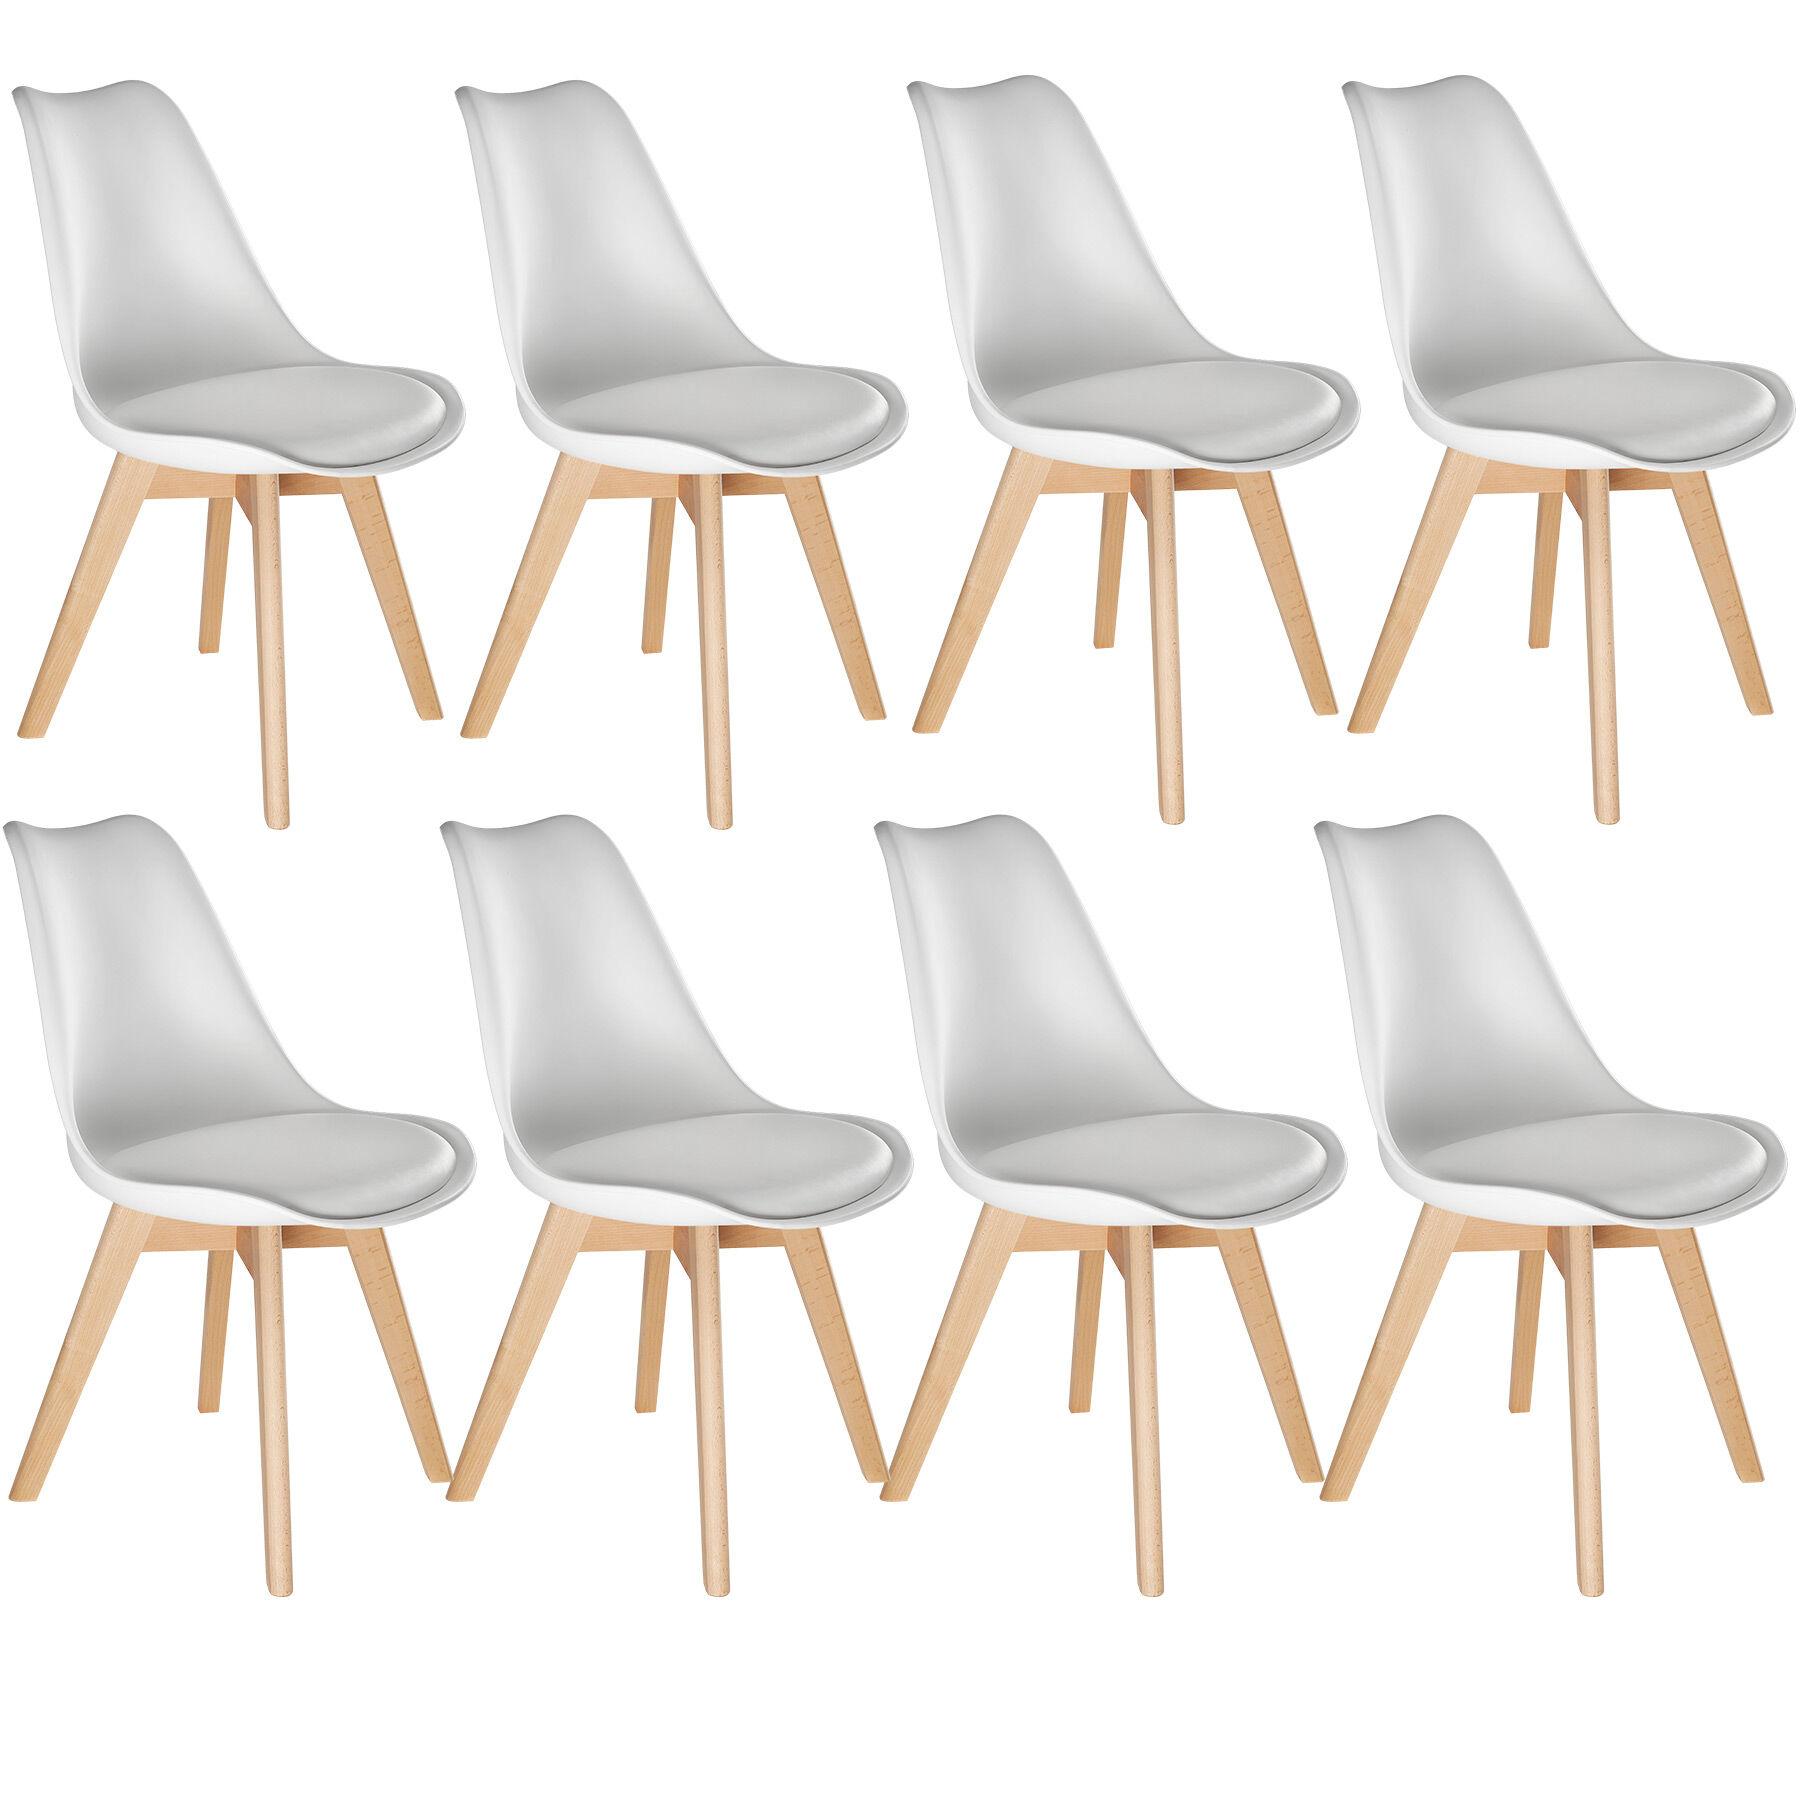 tectake 8 Friederike Dining Chairs - white